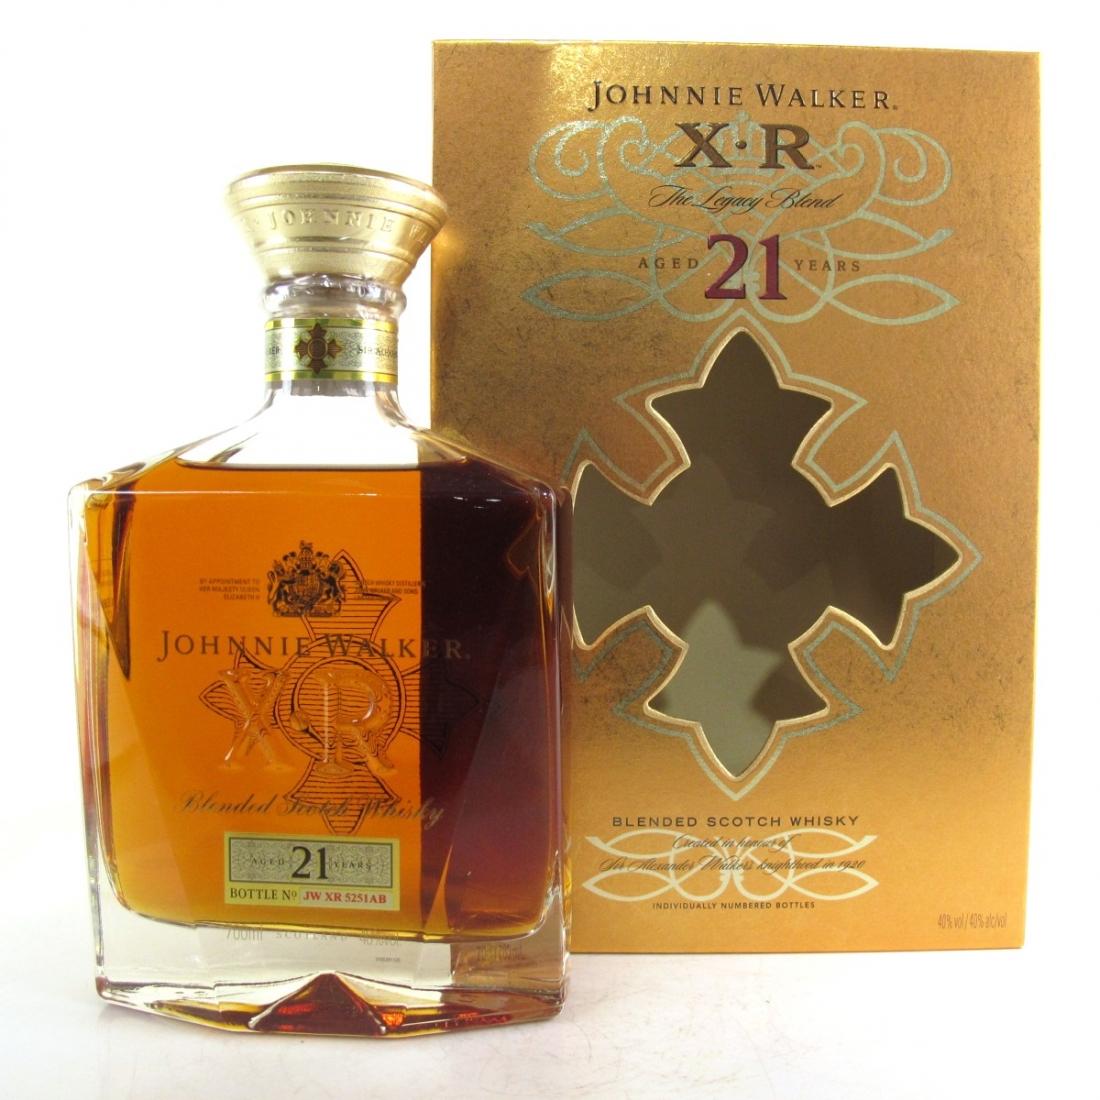 Johnnie Walker XR 21 Year Old